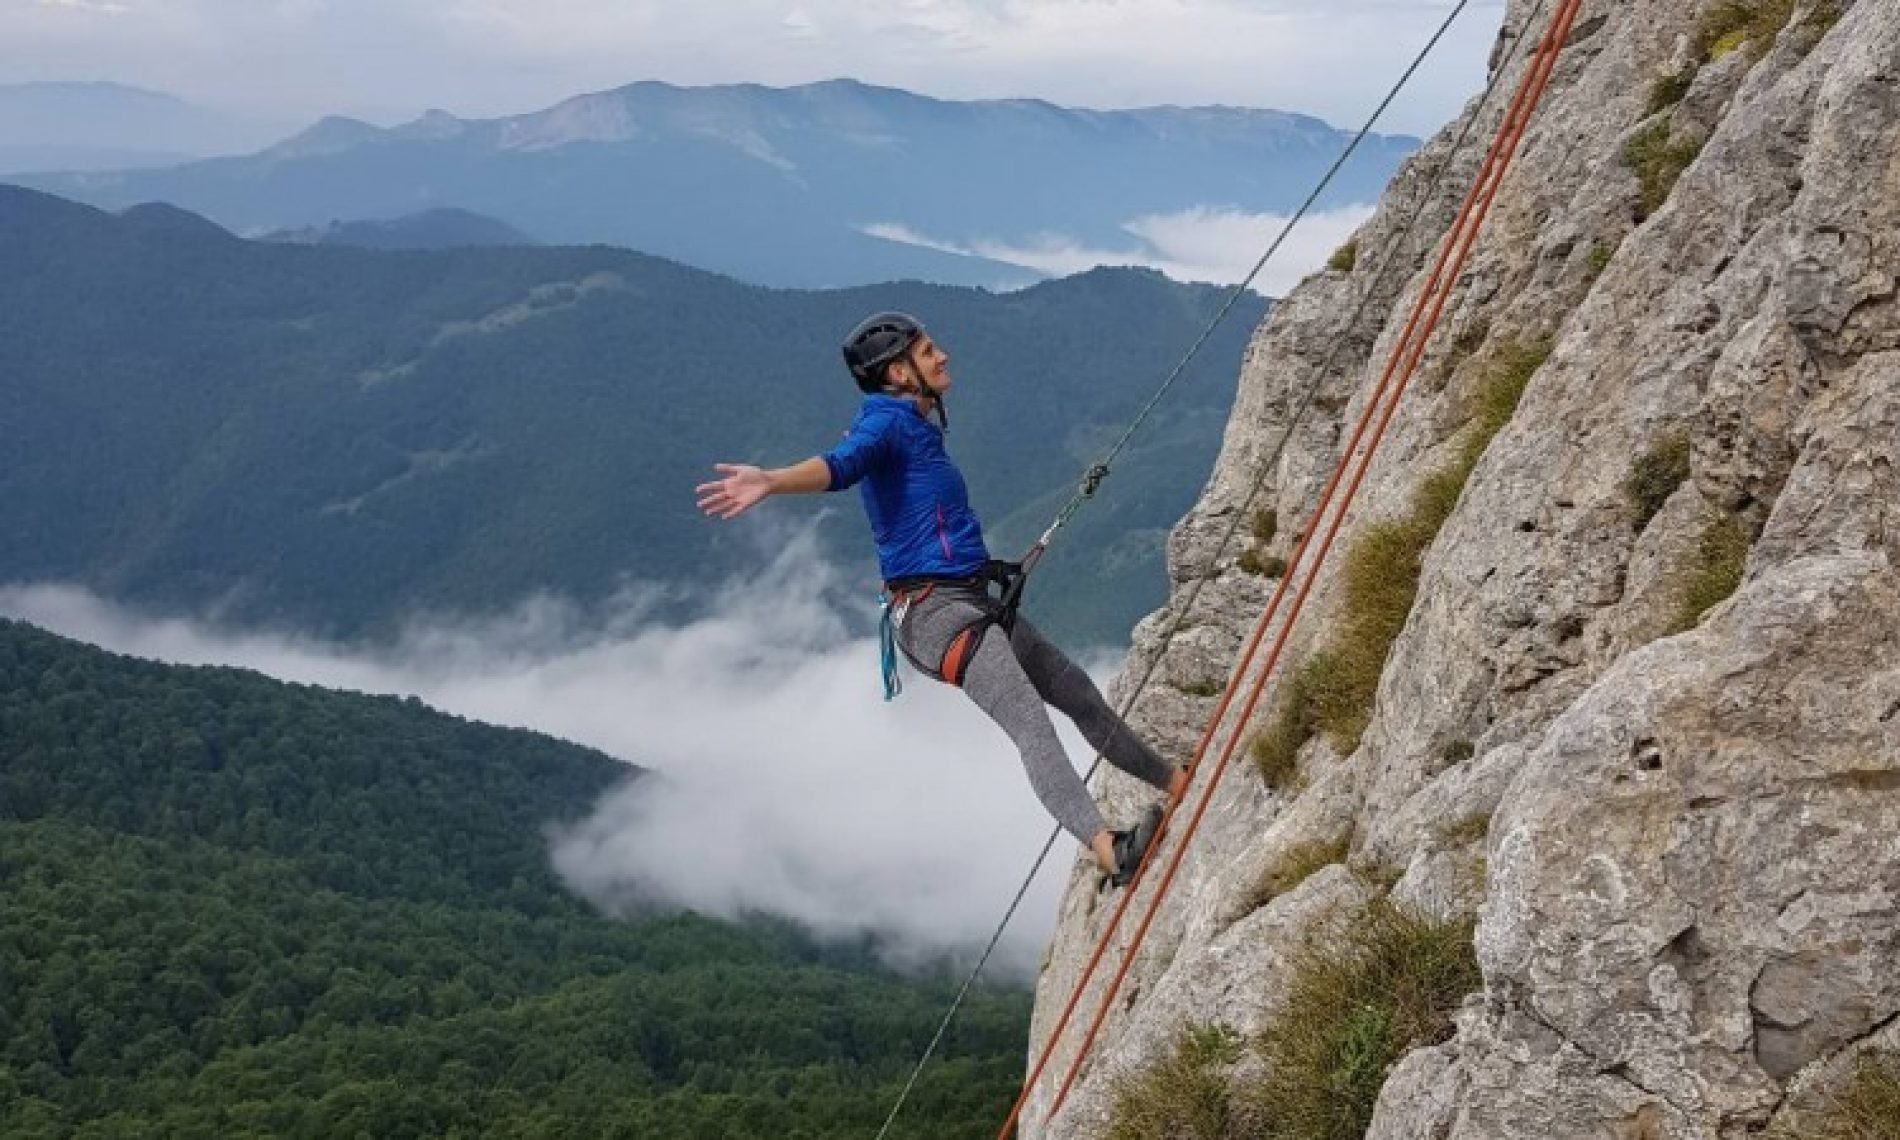 U BPK otvoreno prvo alpinističko penjalište 'Klek'